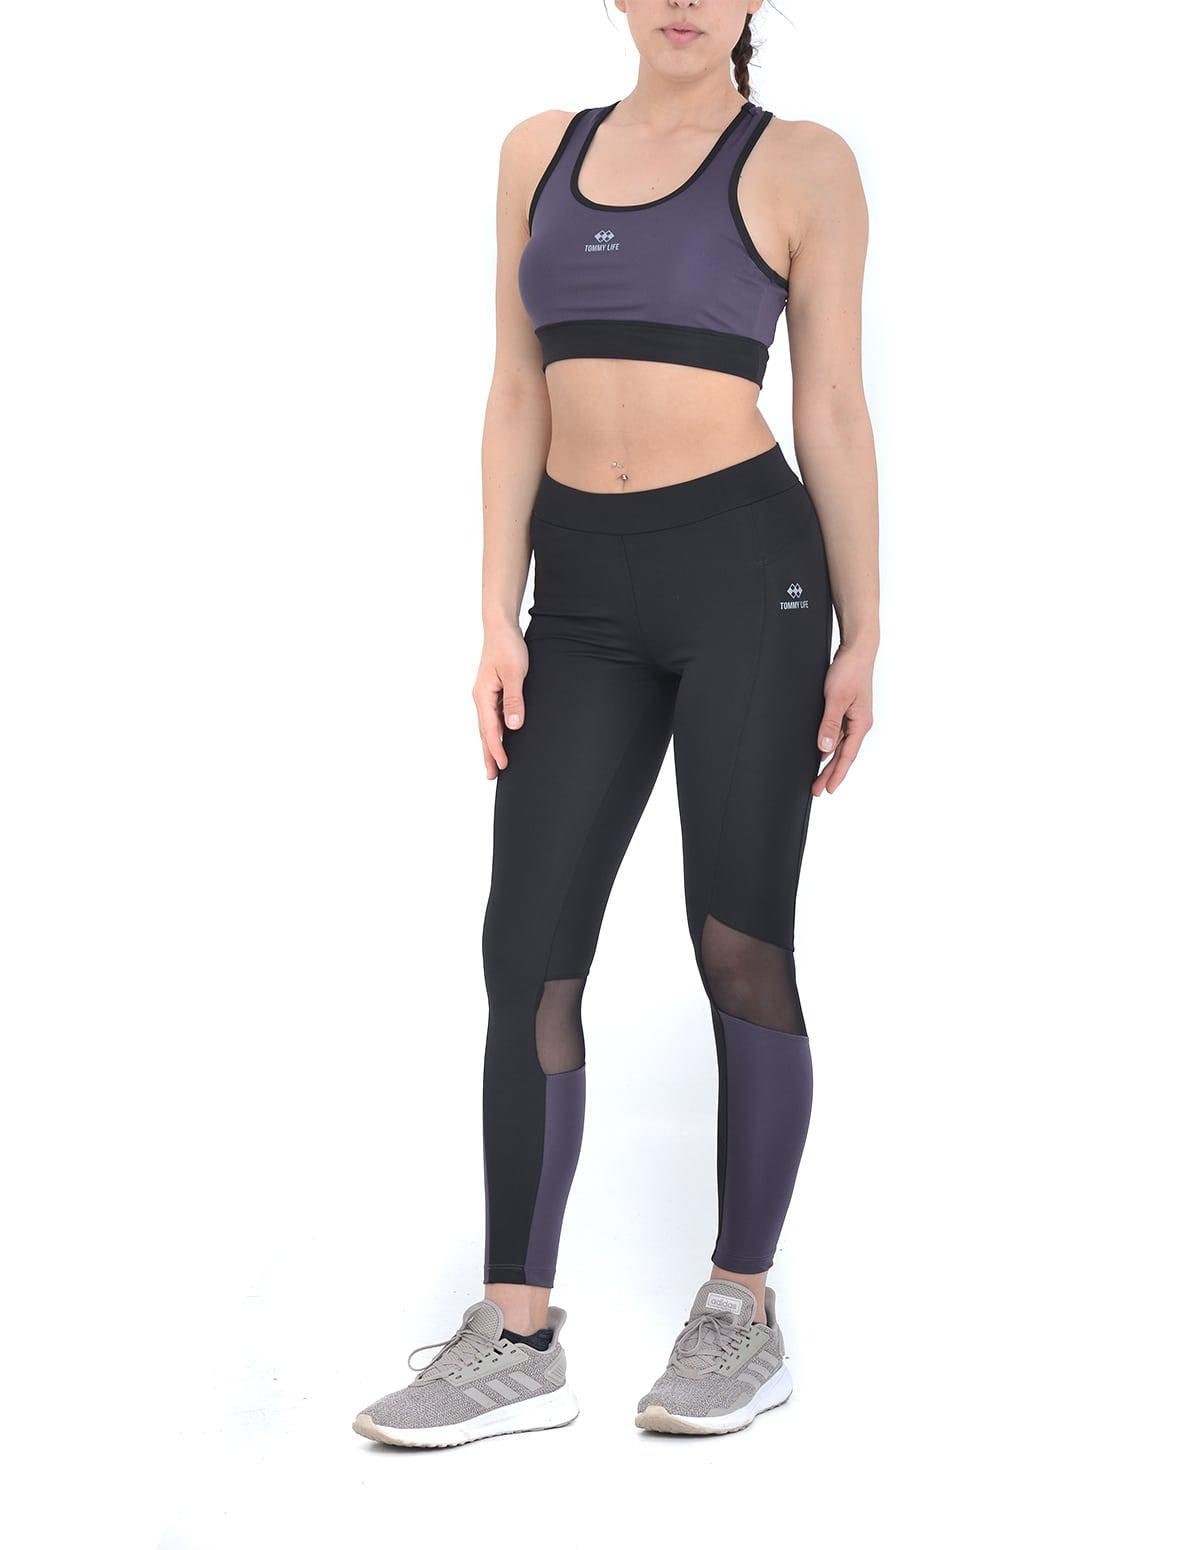 5d11042e4c1 Αθλητικό σετ μπουστάκι και κολάν σε μαύρο-μωβ χρώμα - vactive.gr